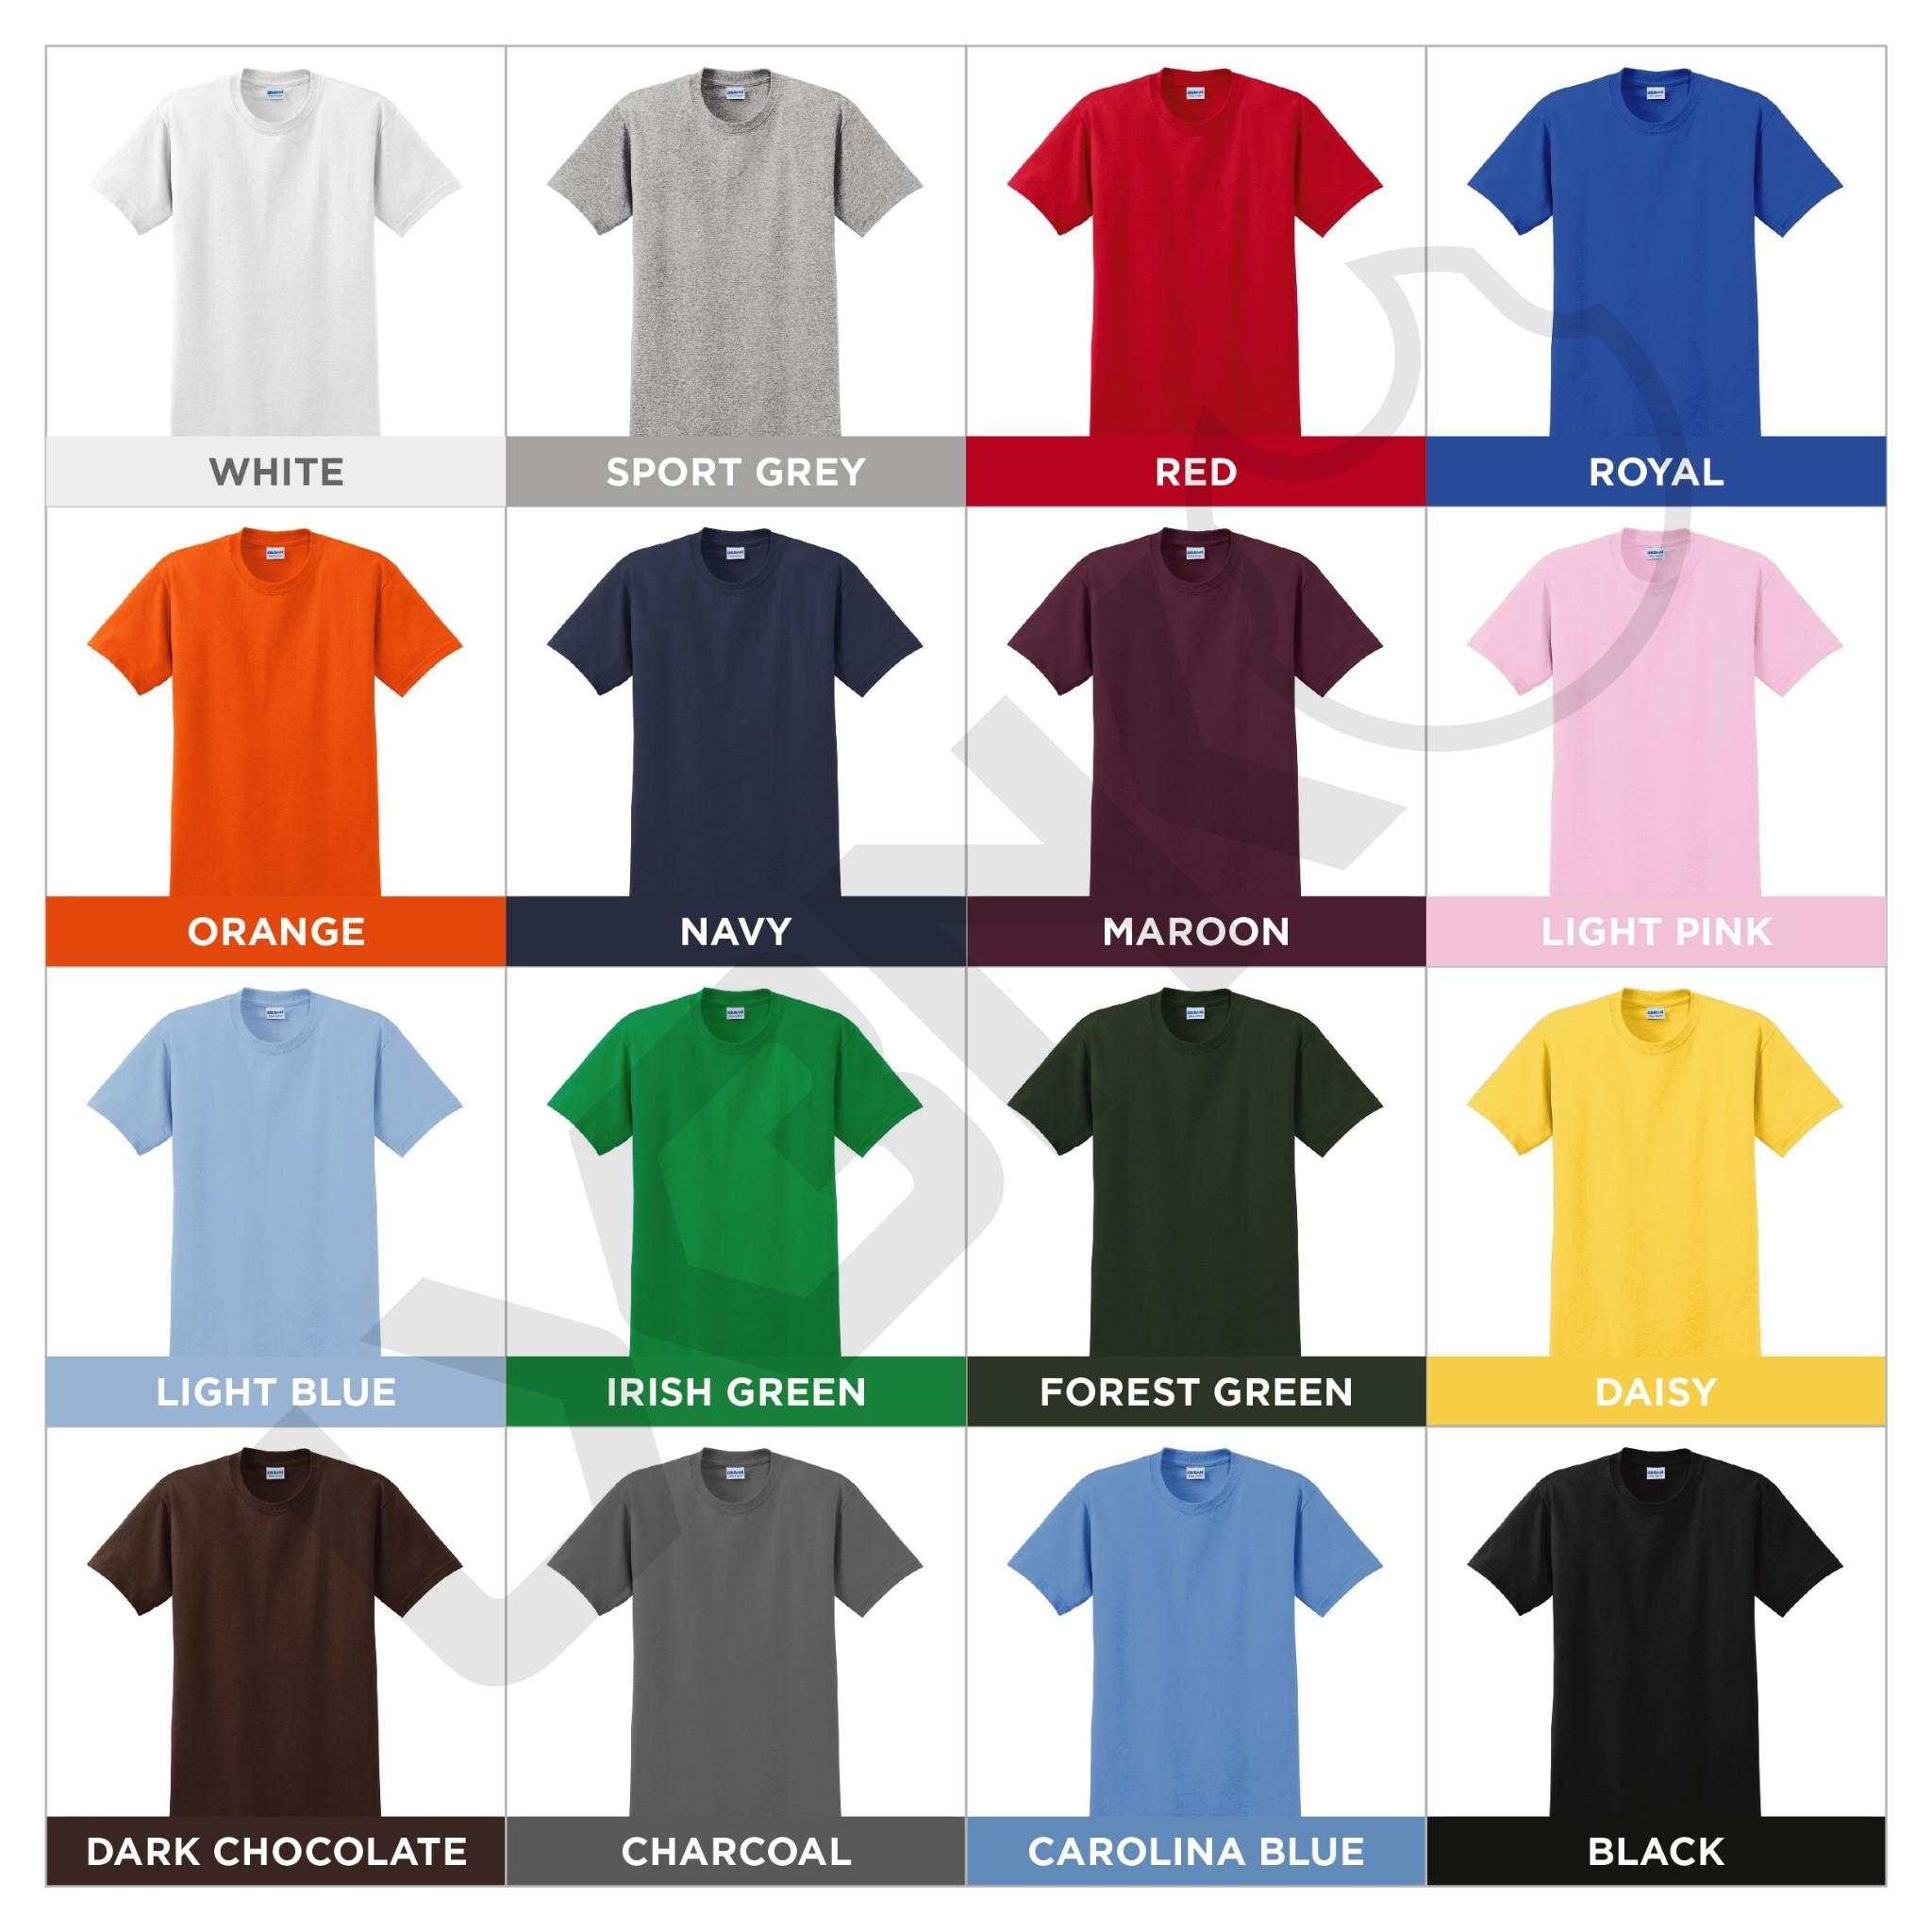 Jual Kaos Polos Cotton Combed 30s 16 Warna - ~Wijaya Store ... d954c75356